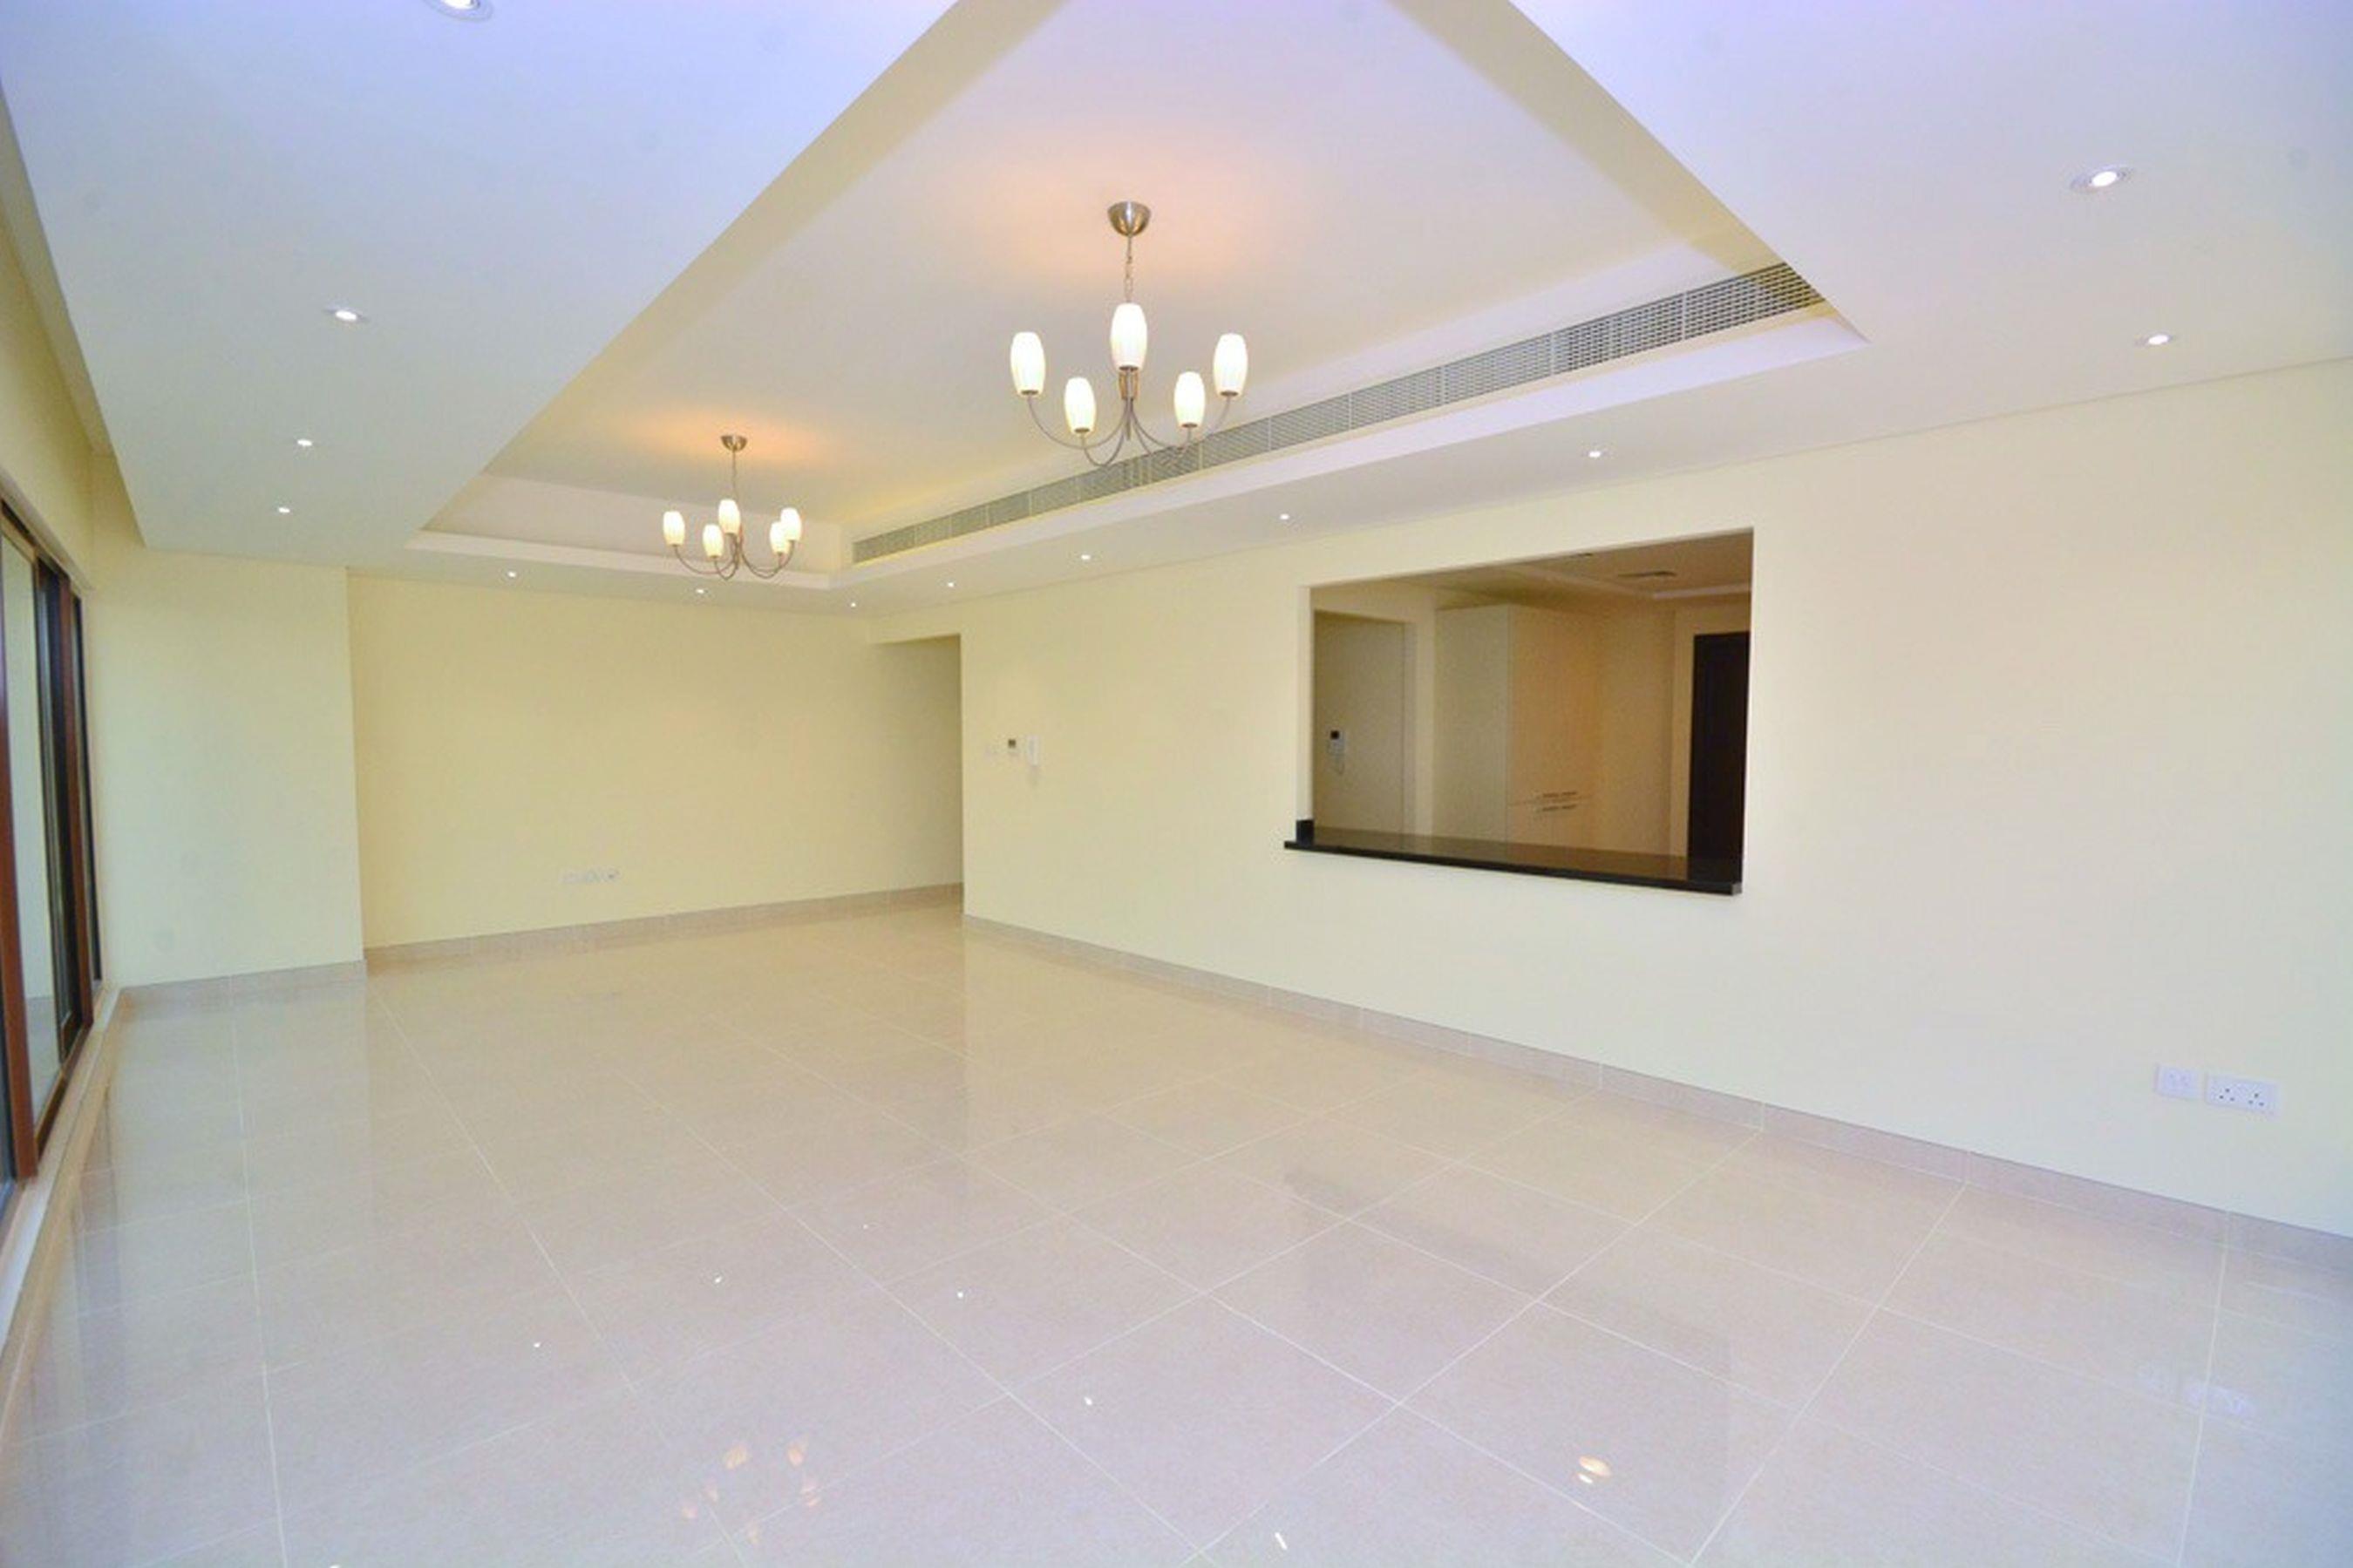 4 Bedroom Contemporary Townhouse in Meydan